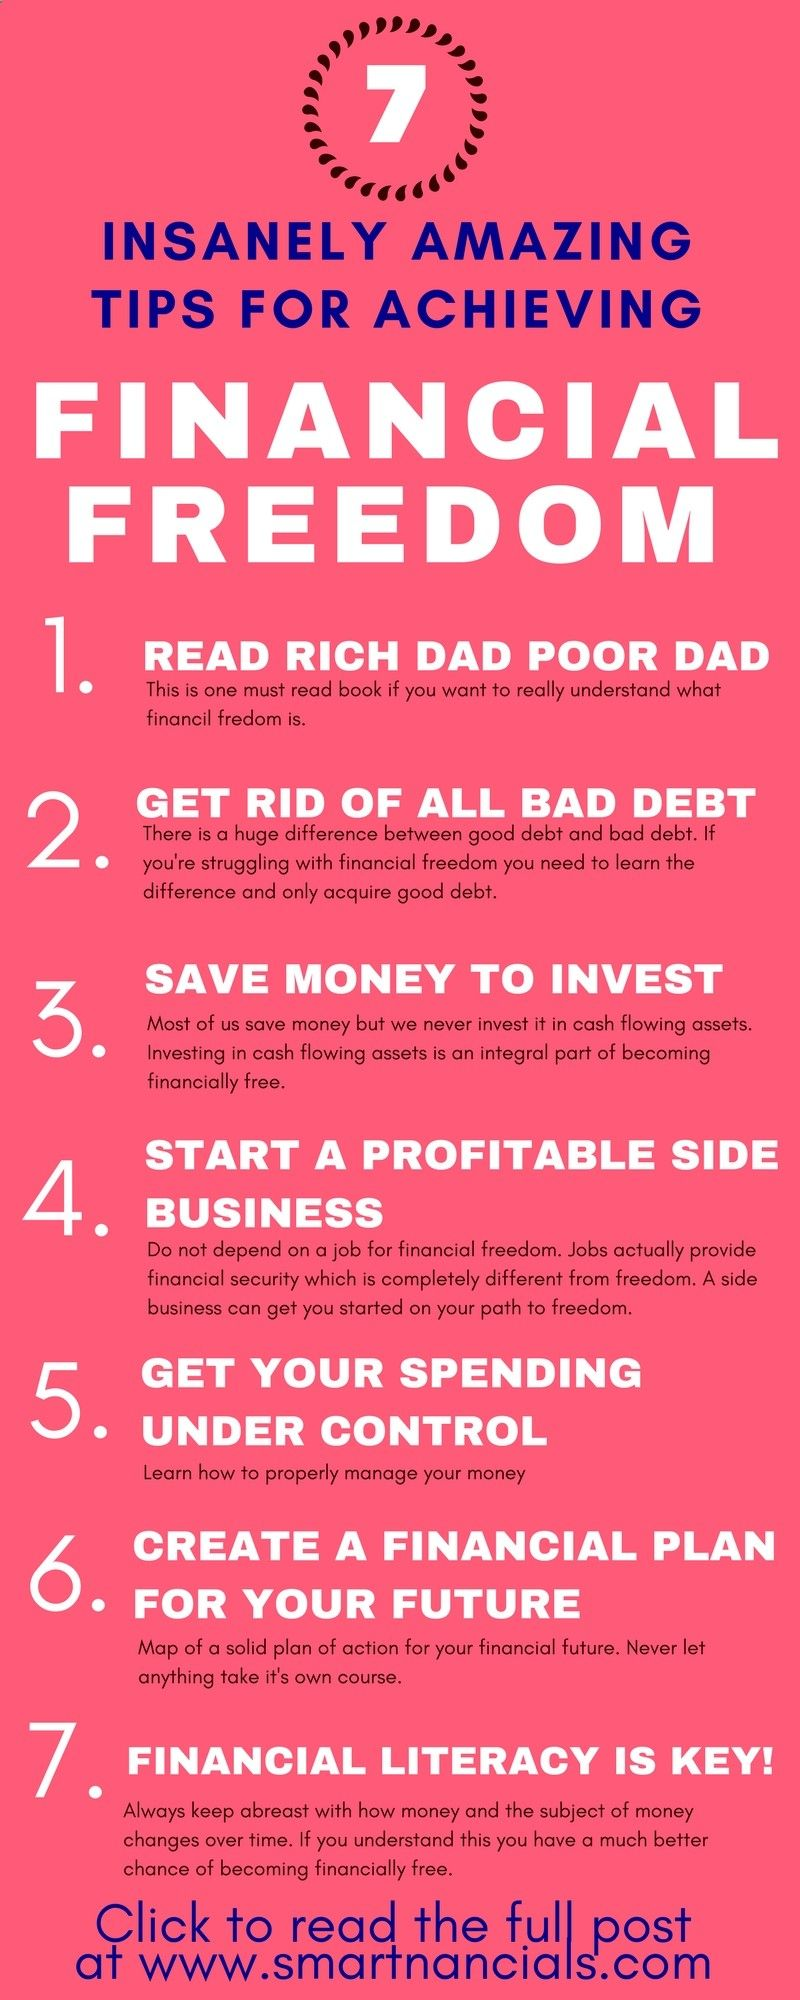 7 Knowledge Ideas Insurance Sales Insurance Marketing Life Insurance Agent